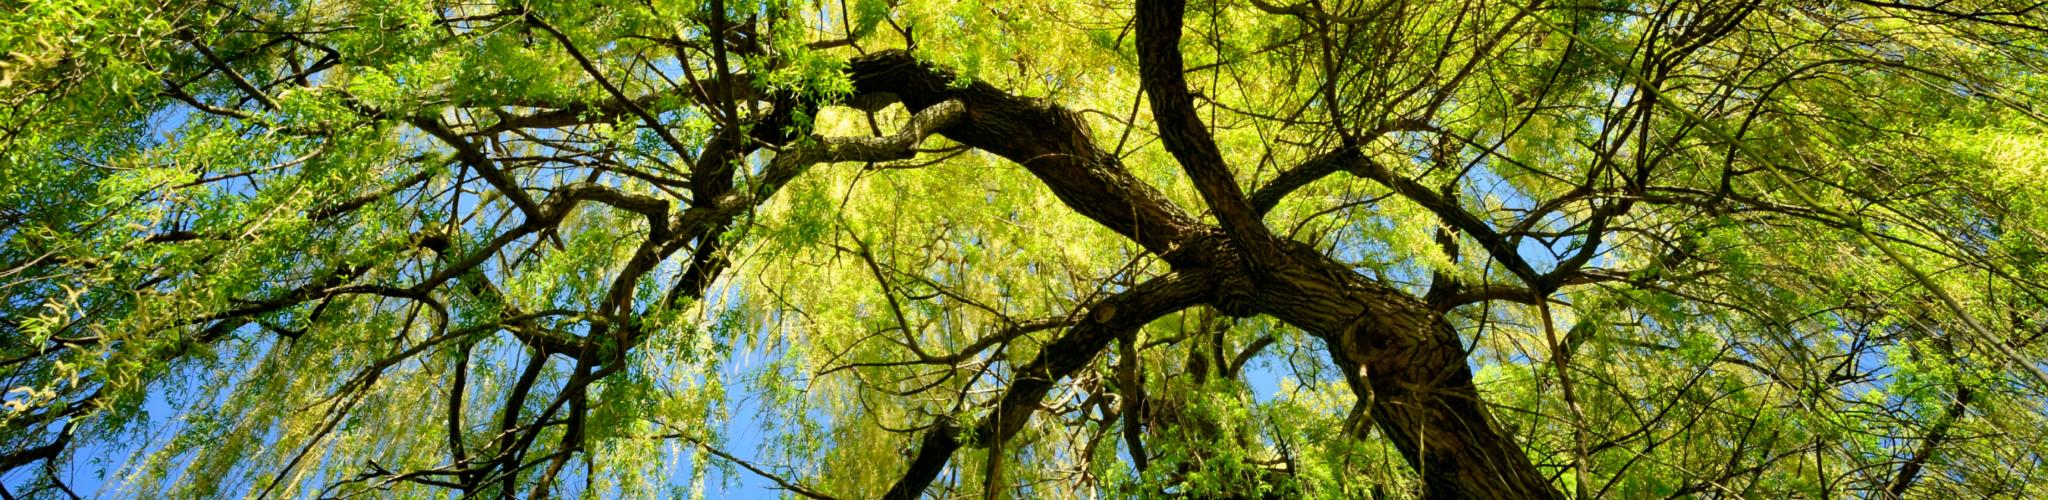 ShadeTrees